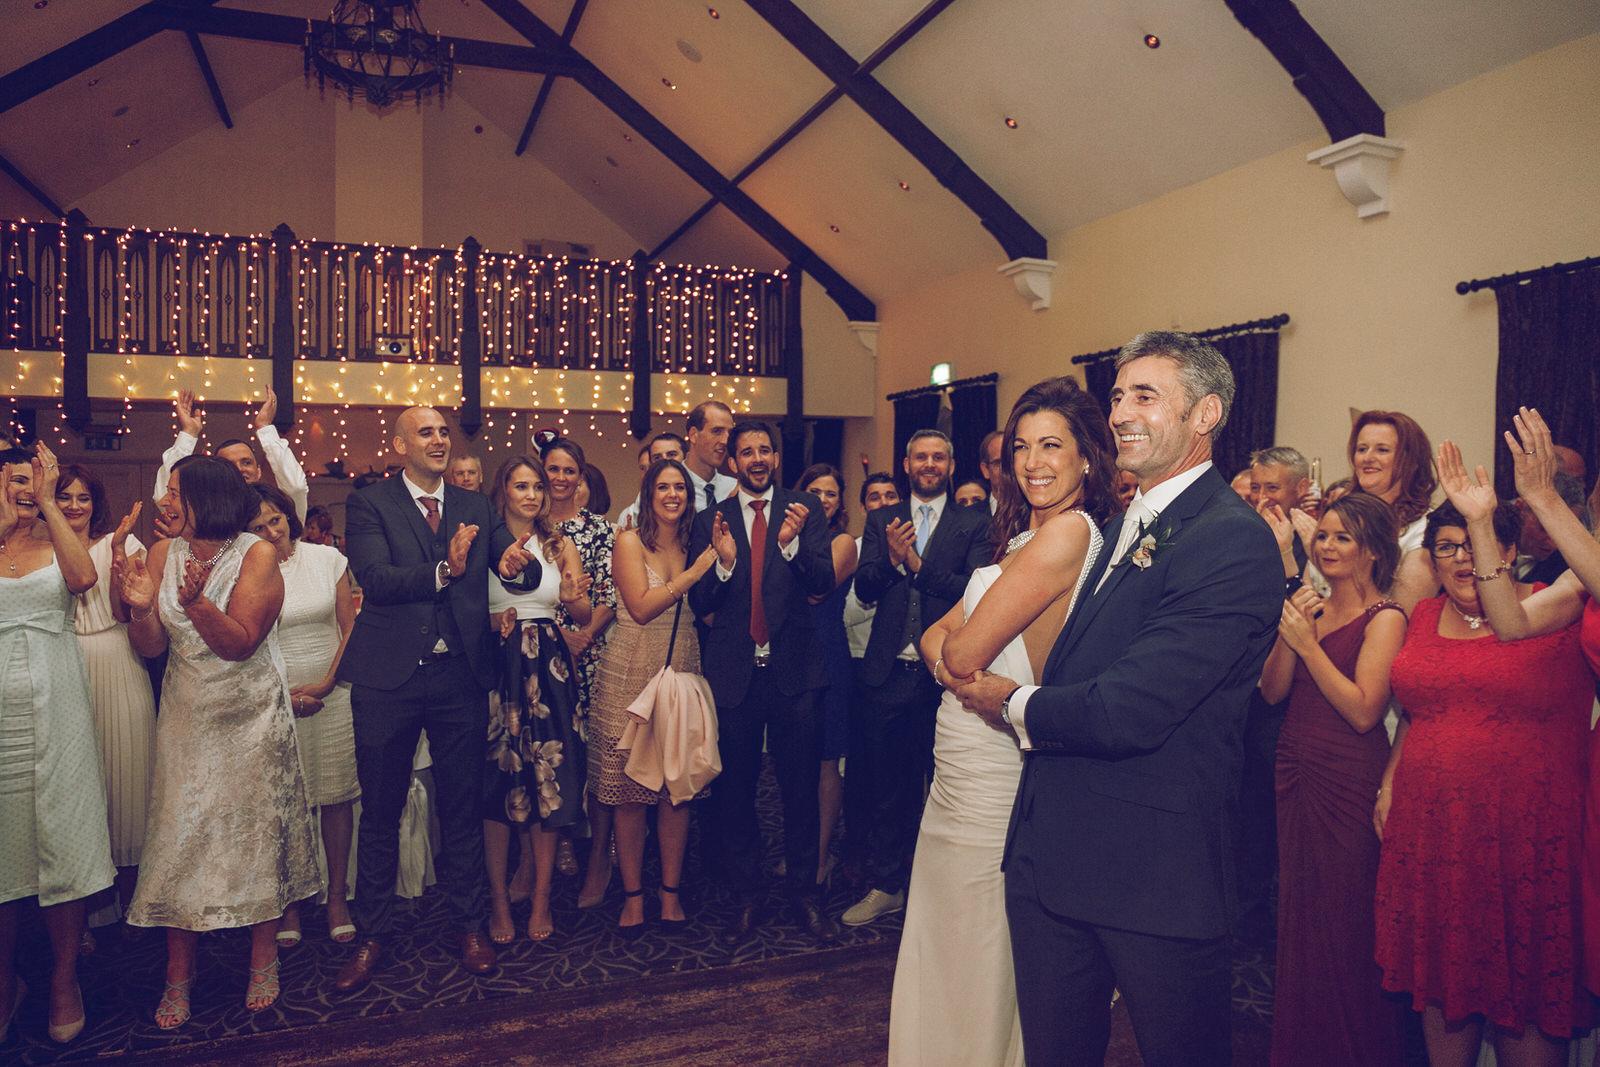 Brooklodge-wicklow-wedding-photographer_147.jpg